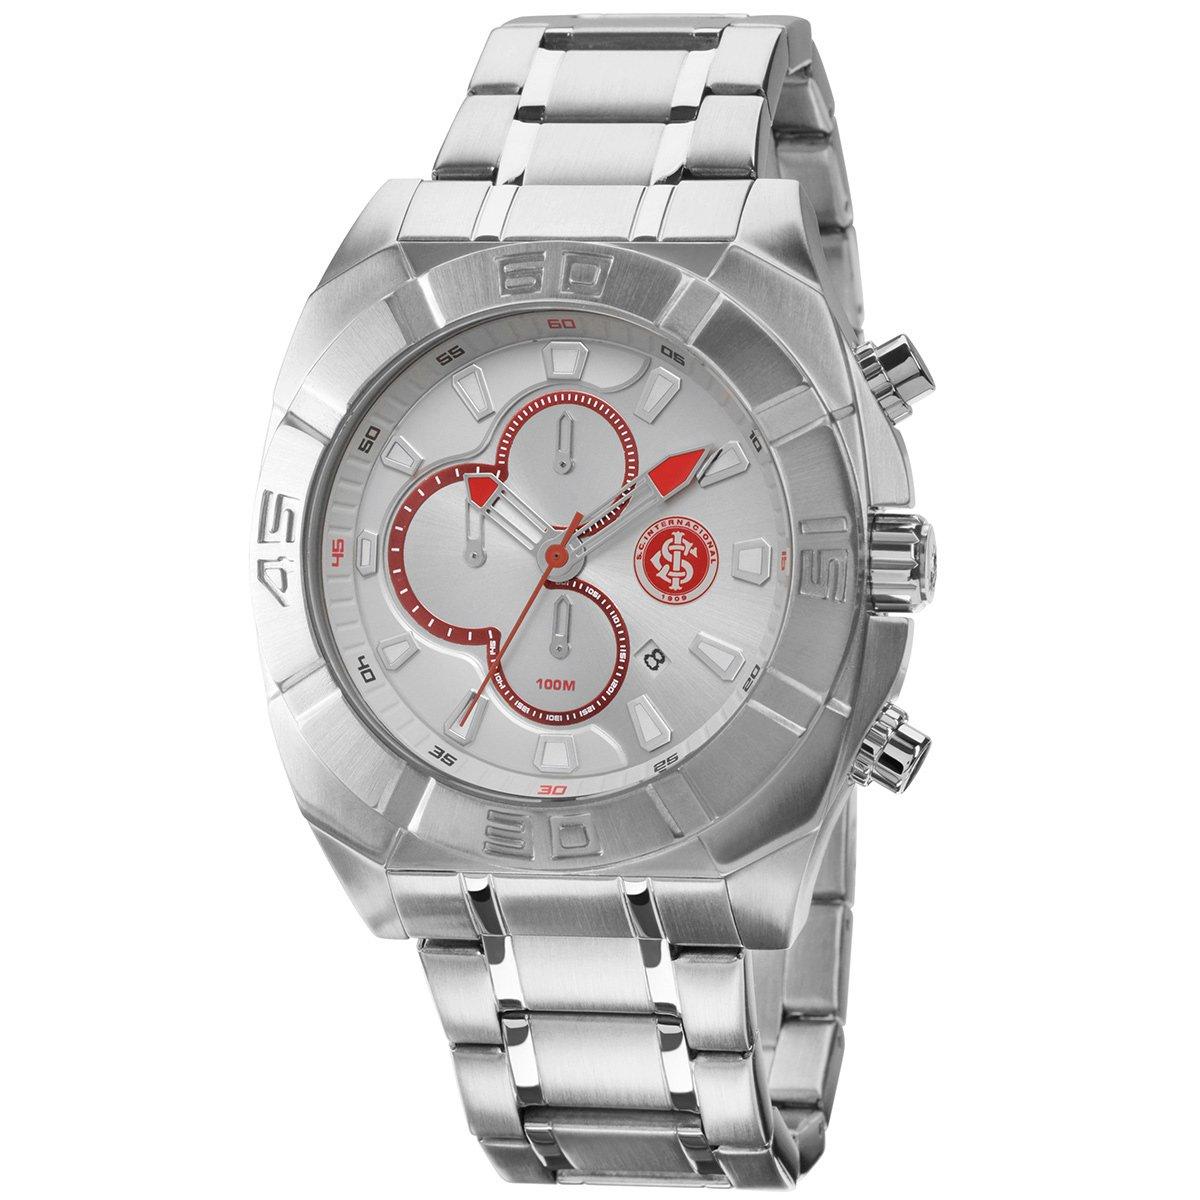 50c752a576d Relógio Technos Internacional Metal Analógico Cronógrafo - Compre Agora